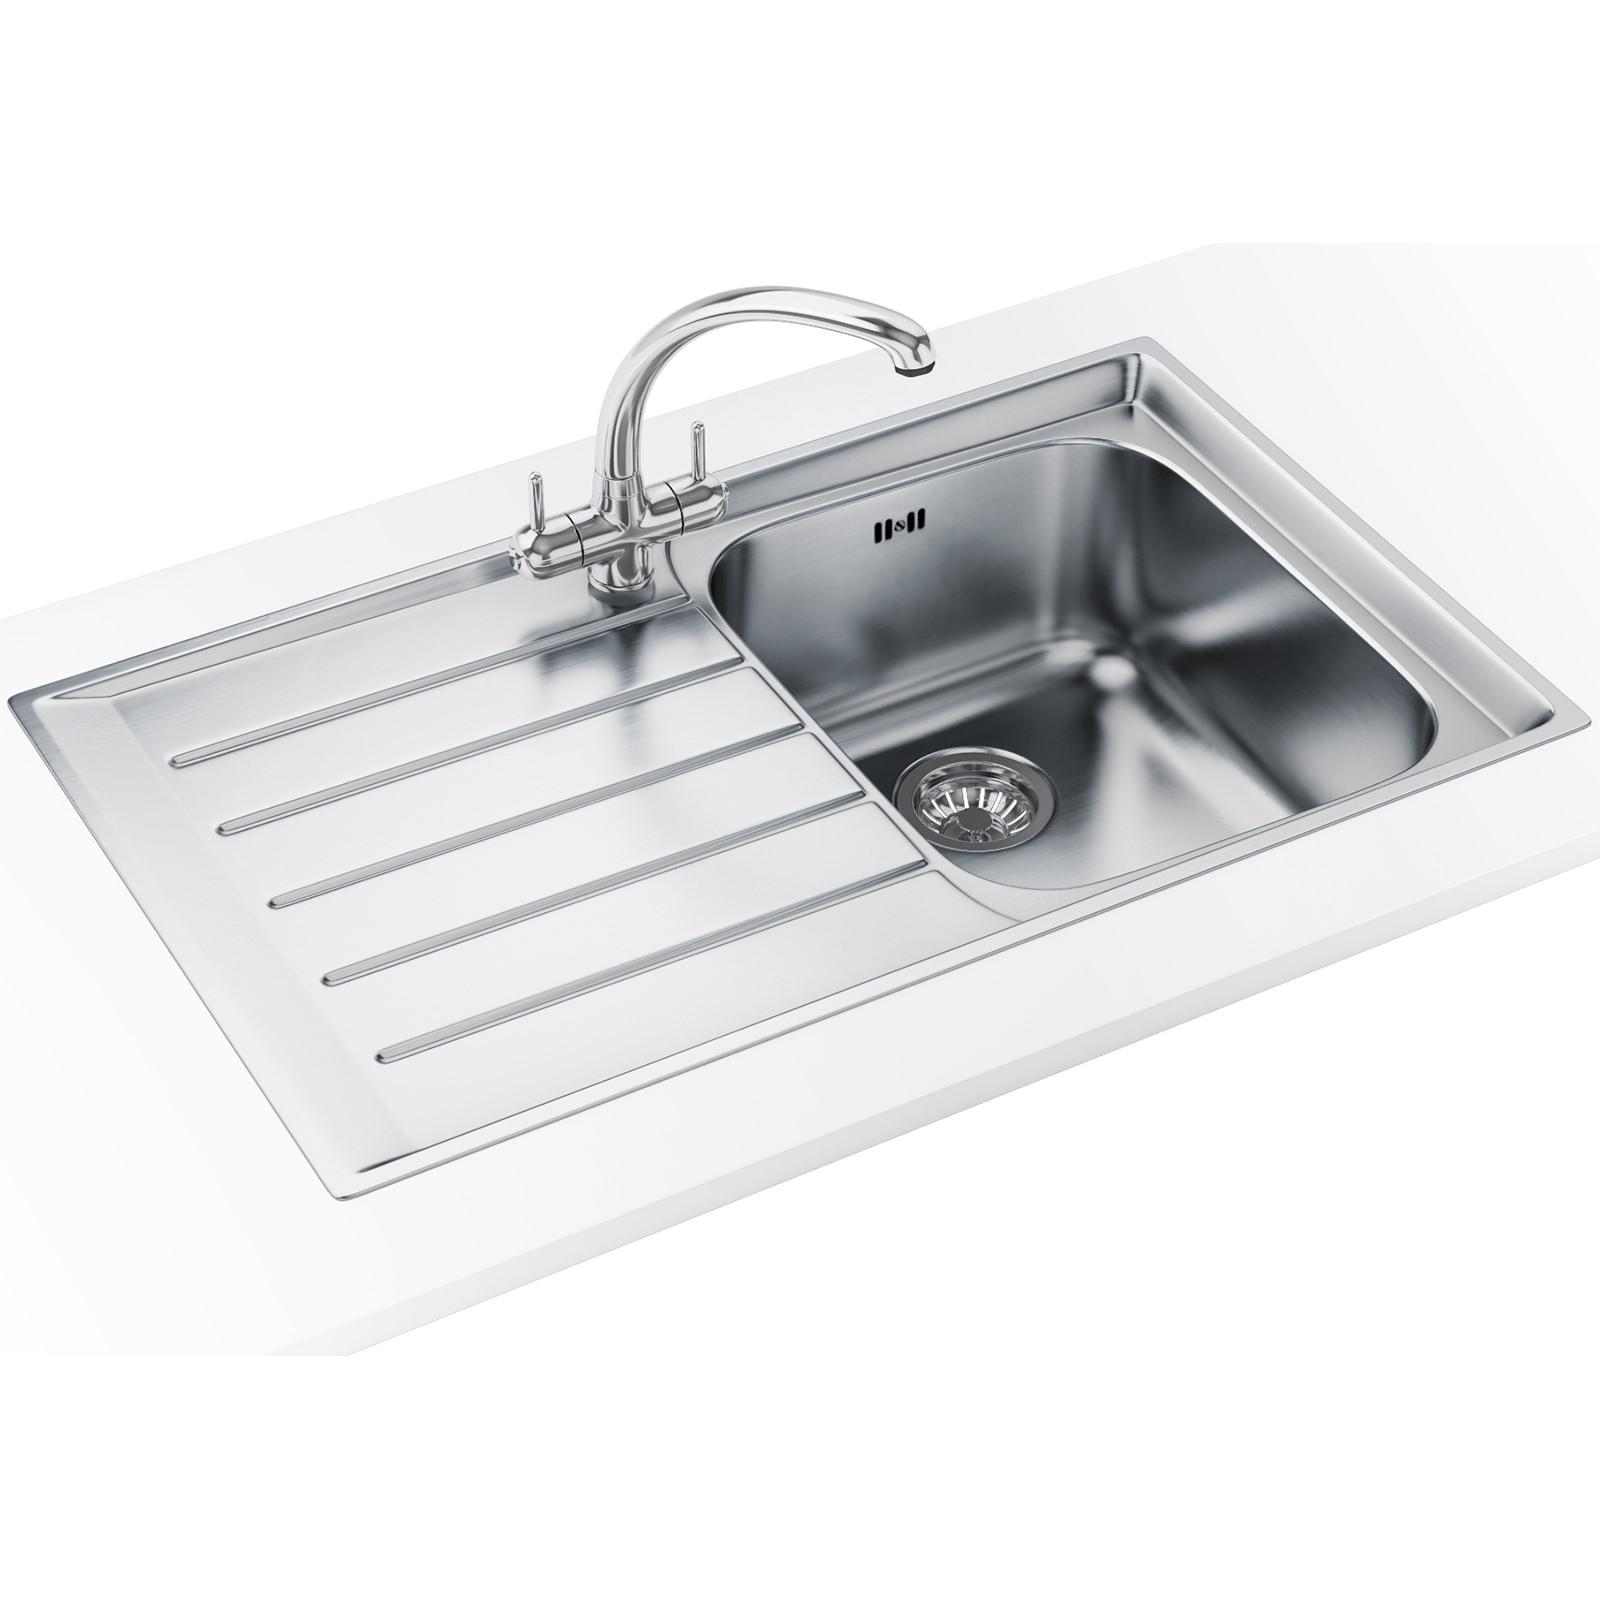 Franke Neptune Propack NEX 211 Stainless Steel Sink And